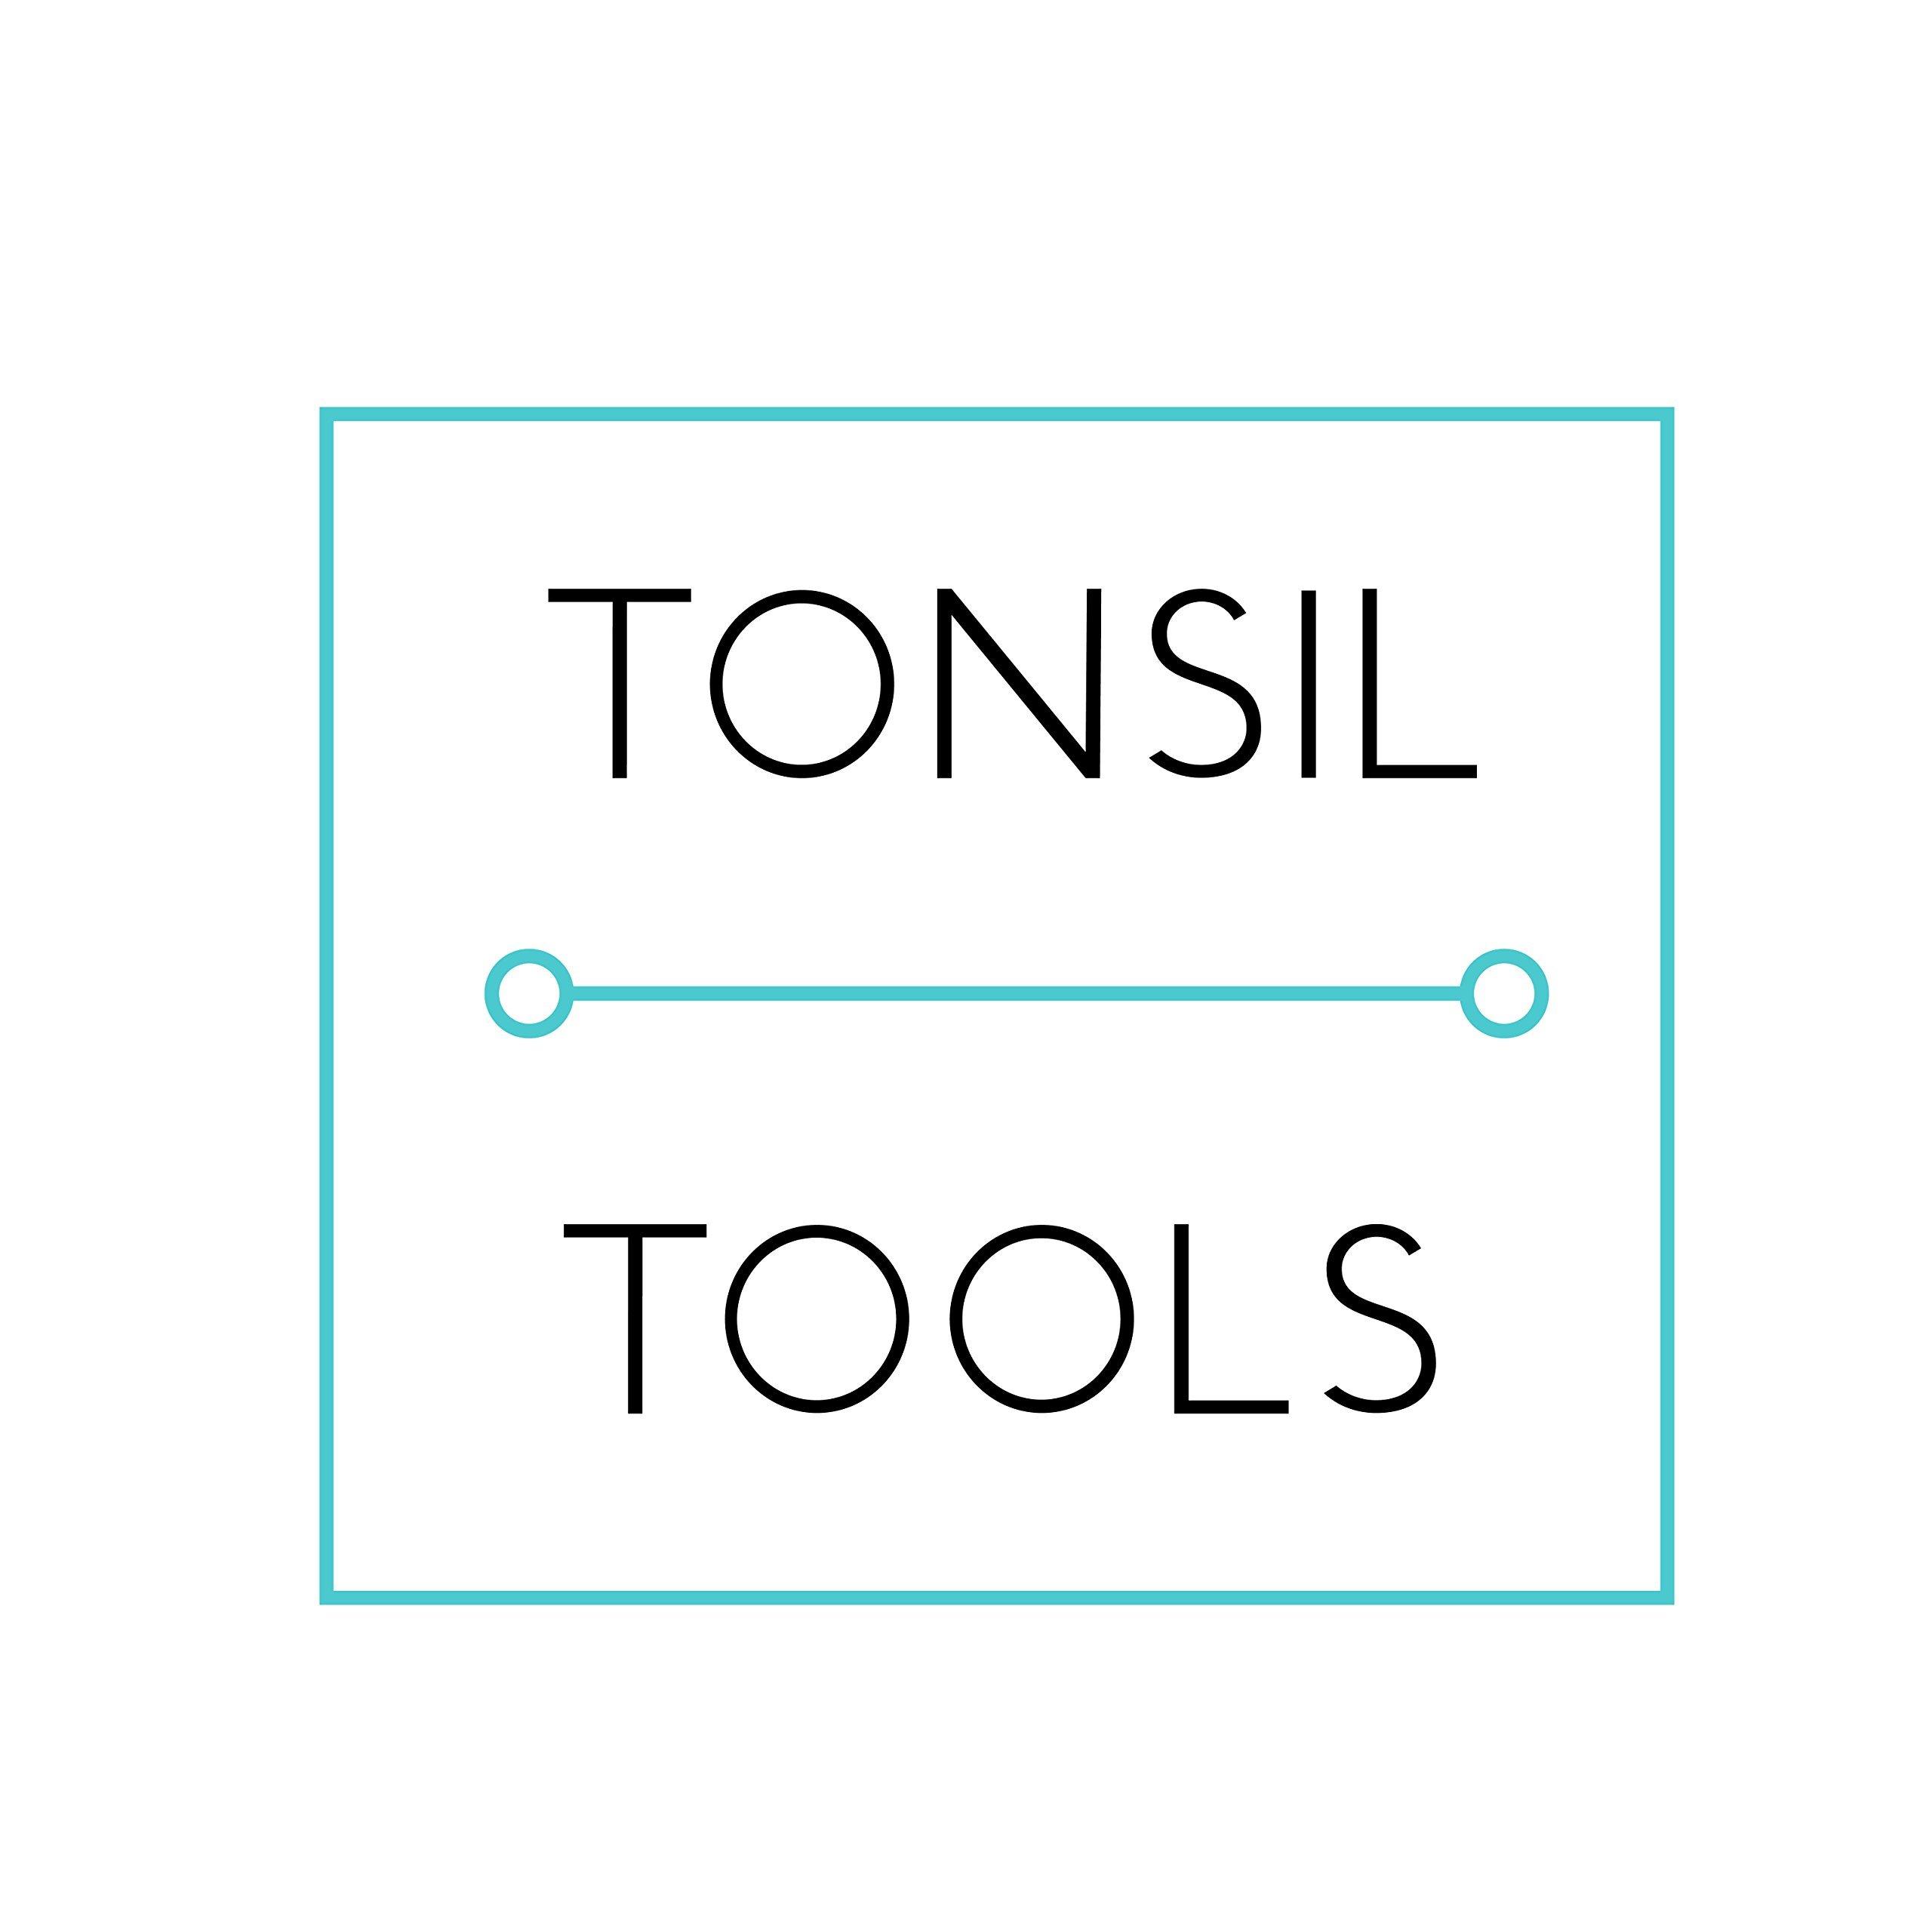 Premium Tonsil Stone Removal Kit; LED Tonsil Tool w/ 3 Adaptors, Stainless Steel Tonsil Pick, 12ml Curved Tonsil Irrigation Syringe